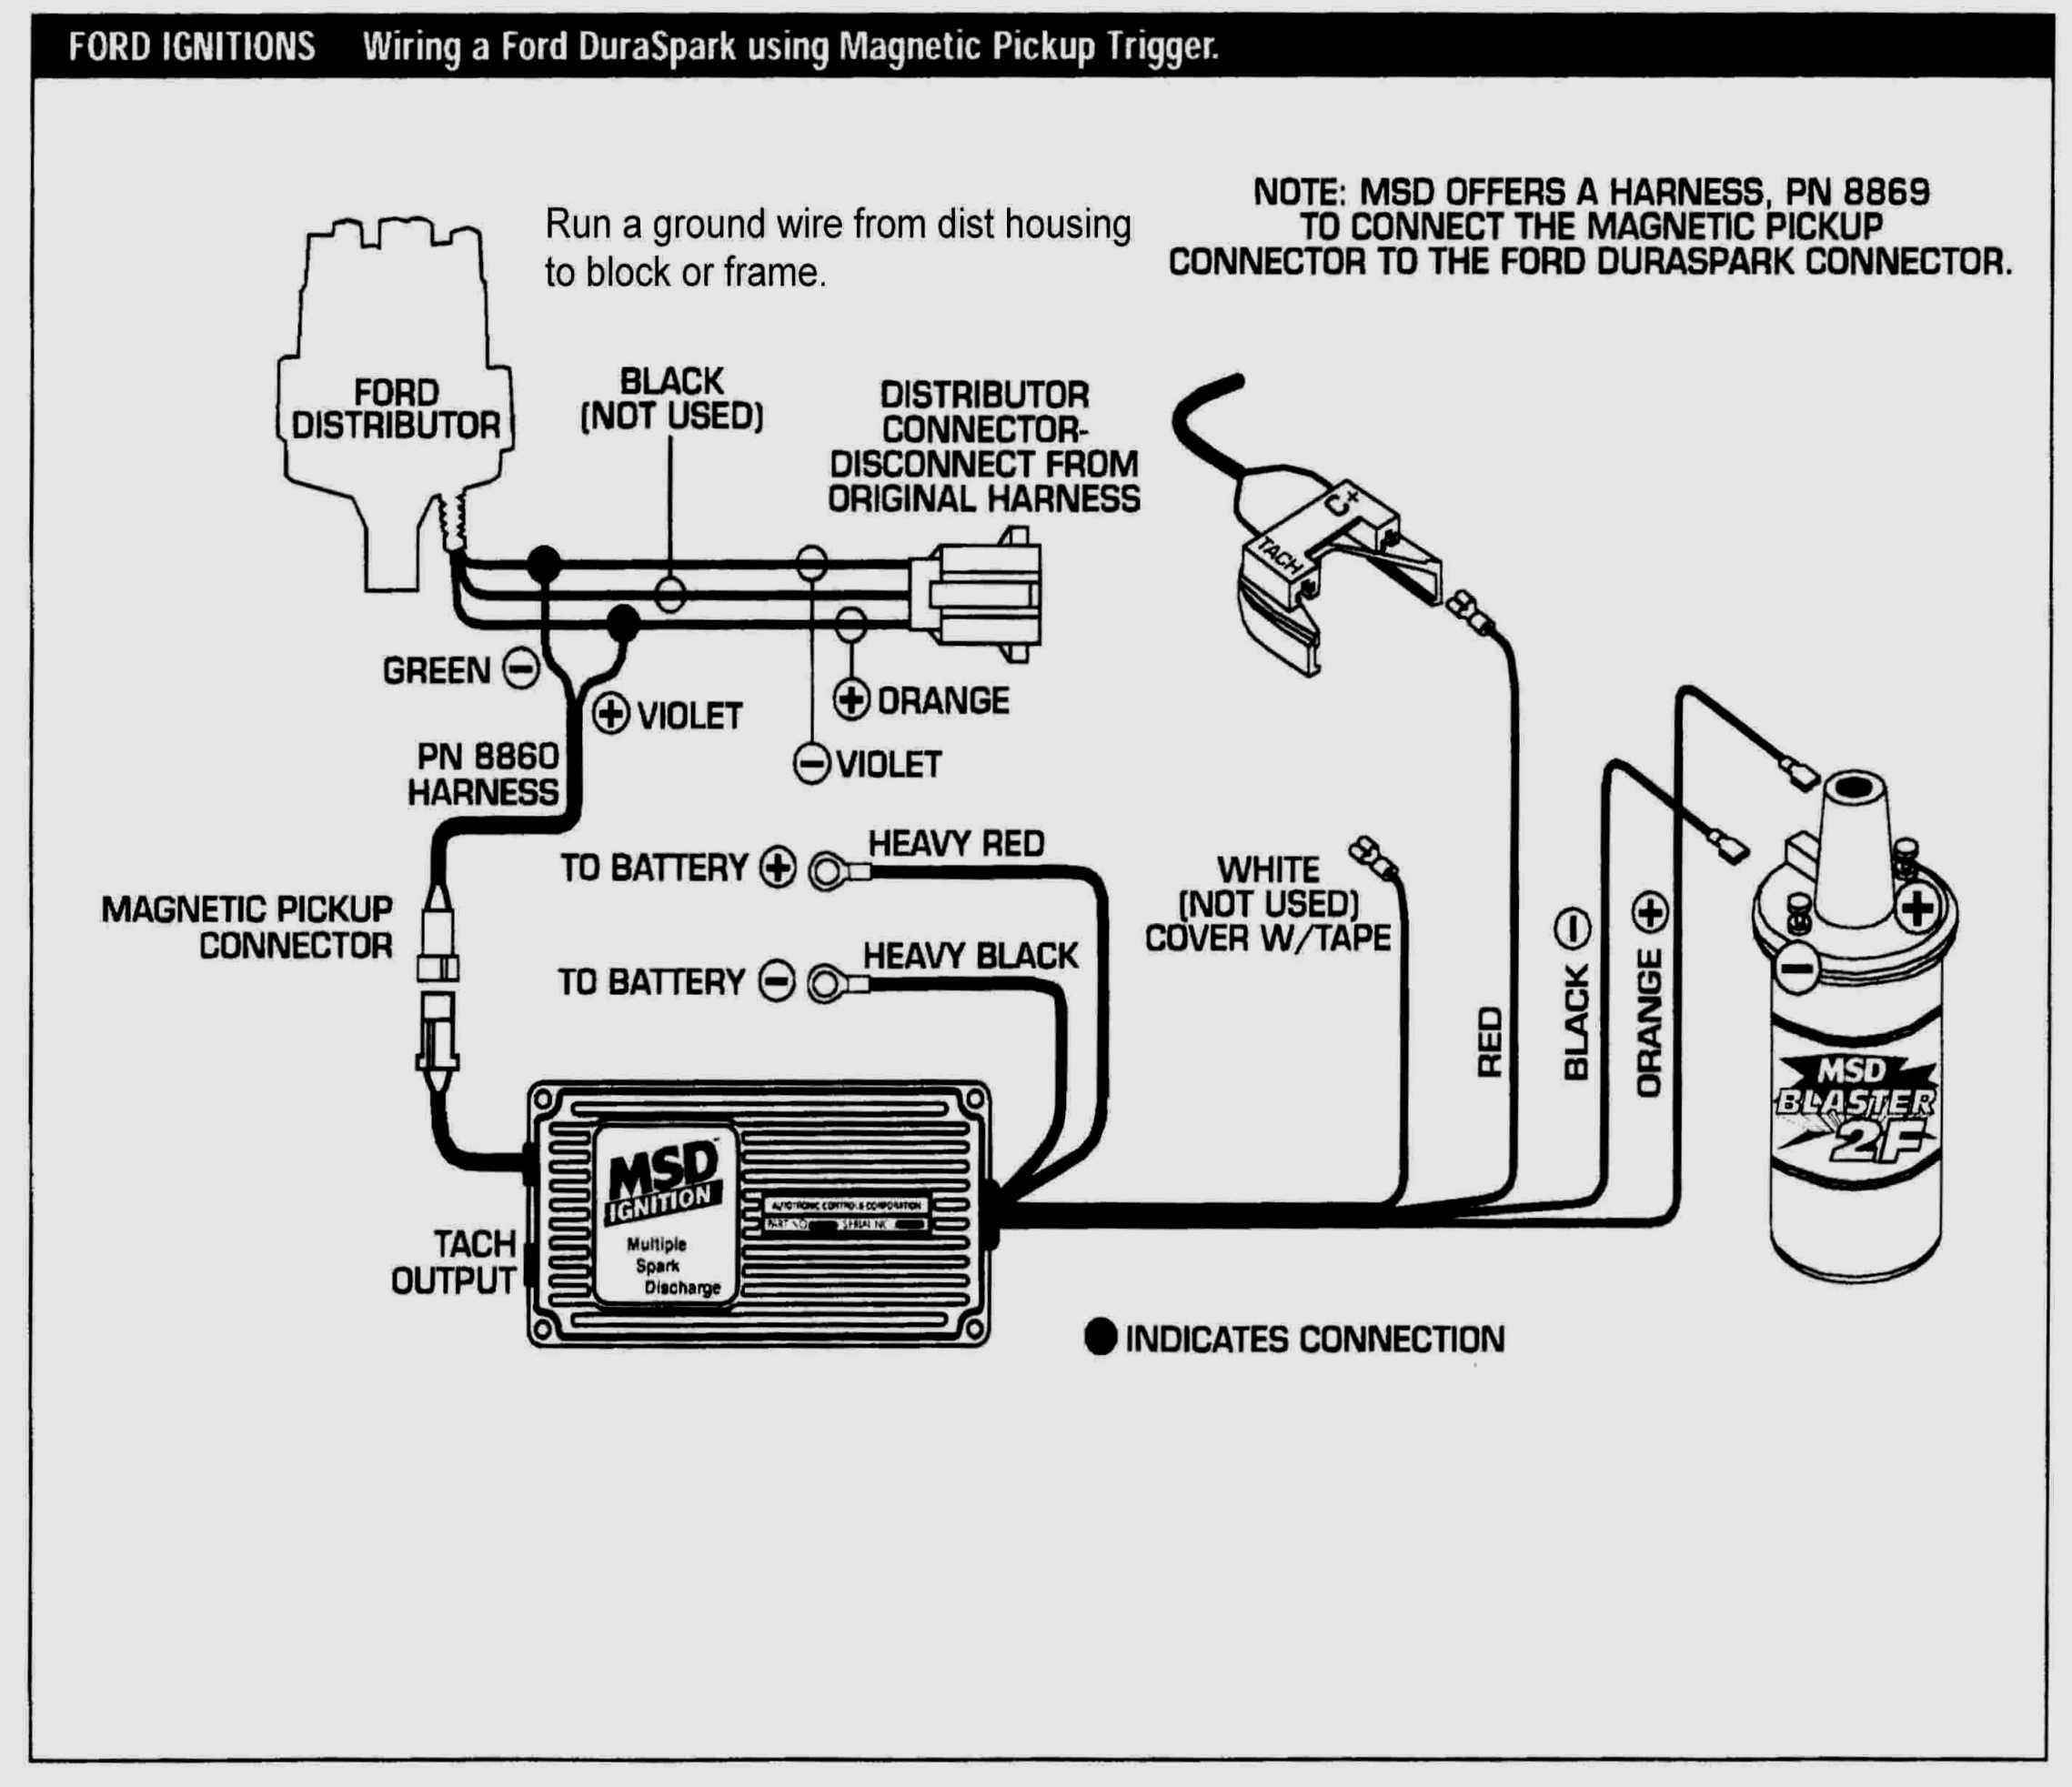 Accel Control Module Wiring Diagram | Wiring Diagram Library - Ford Ignition Control Module Wiring Diagram